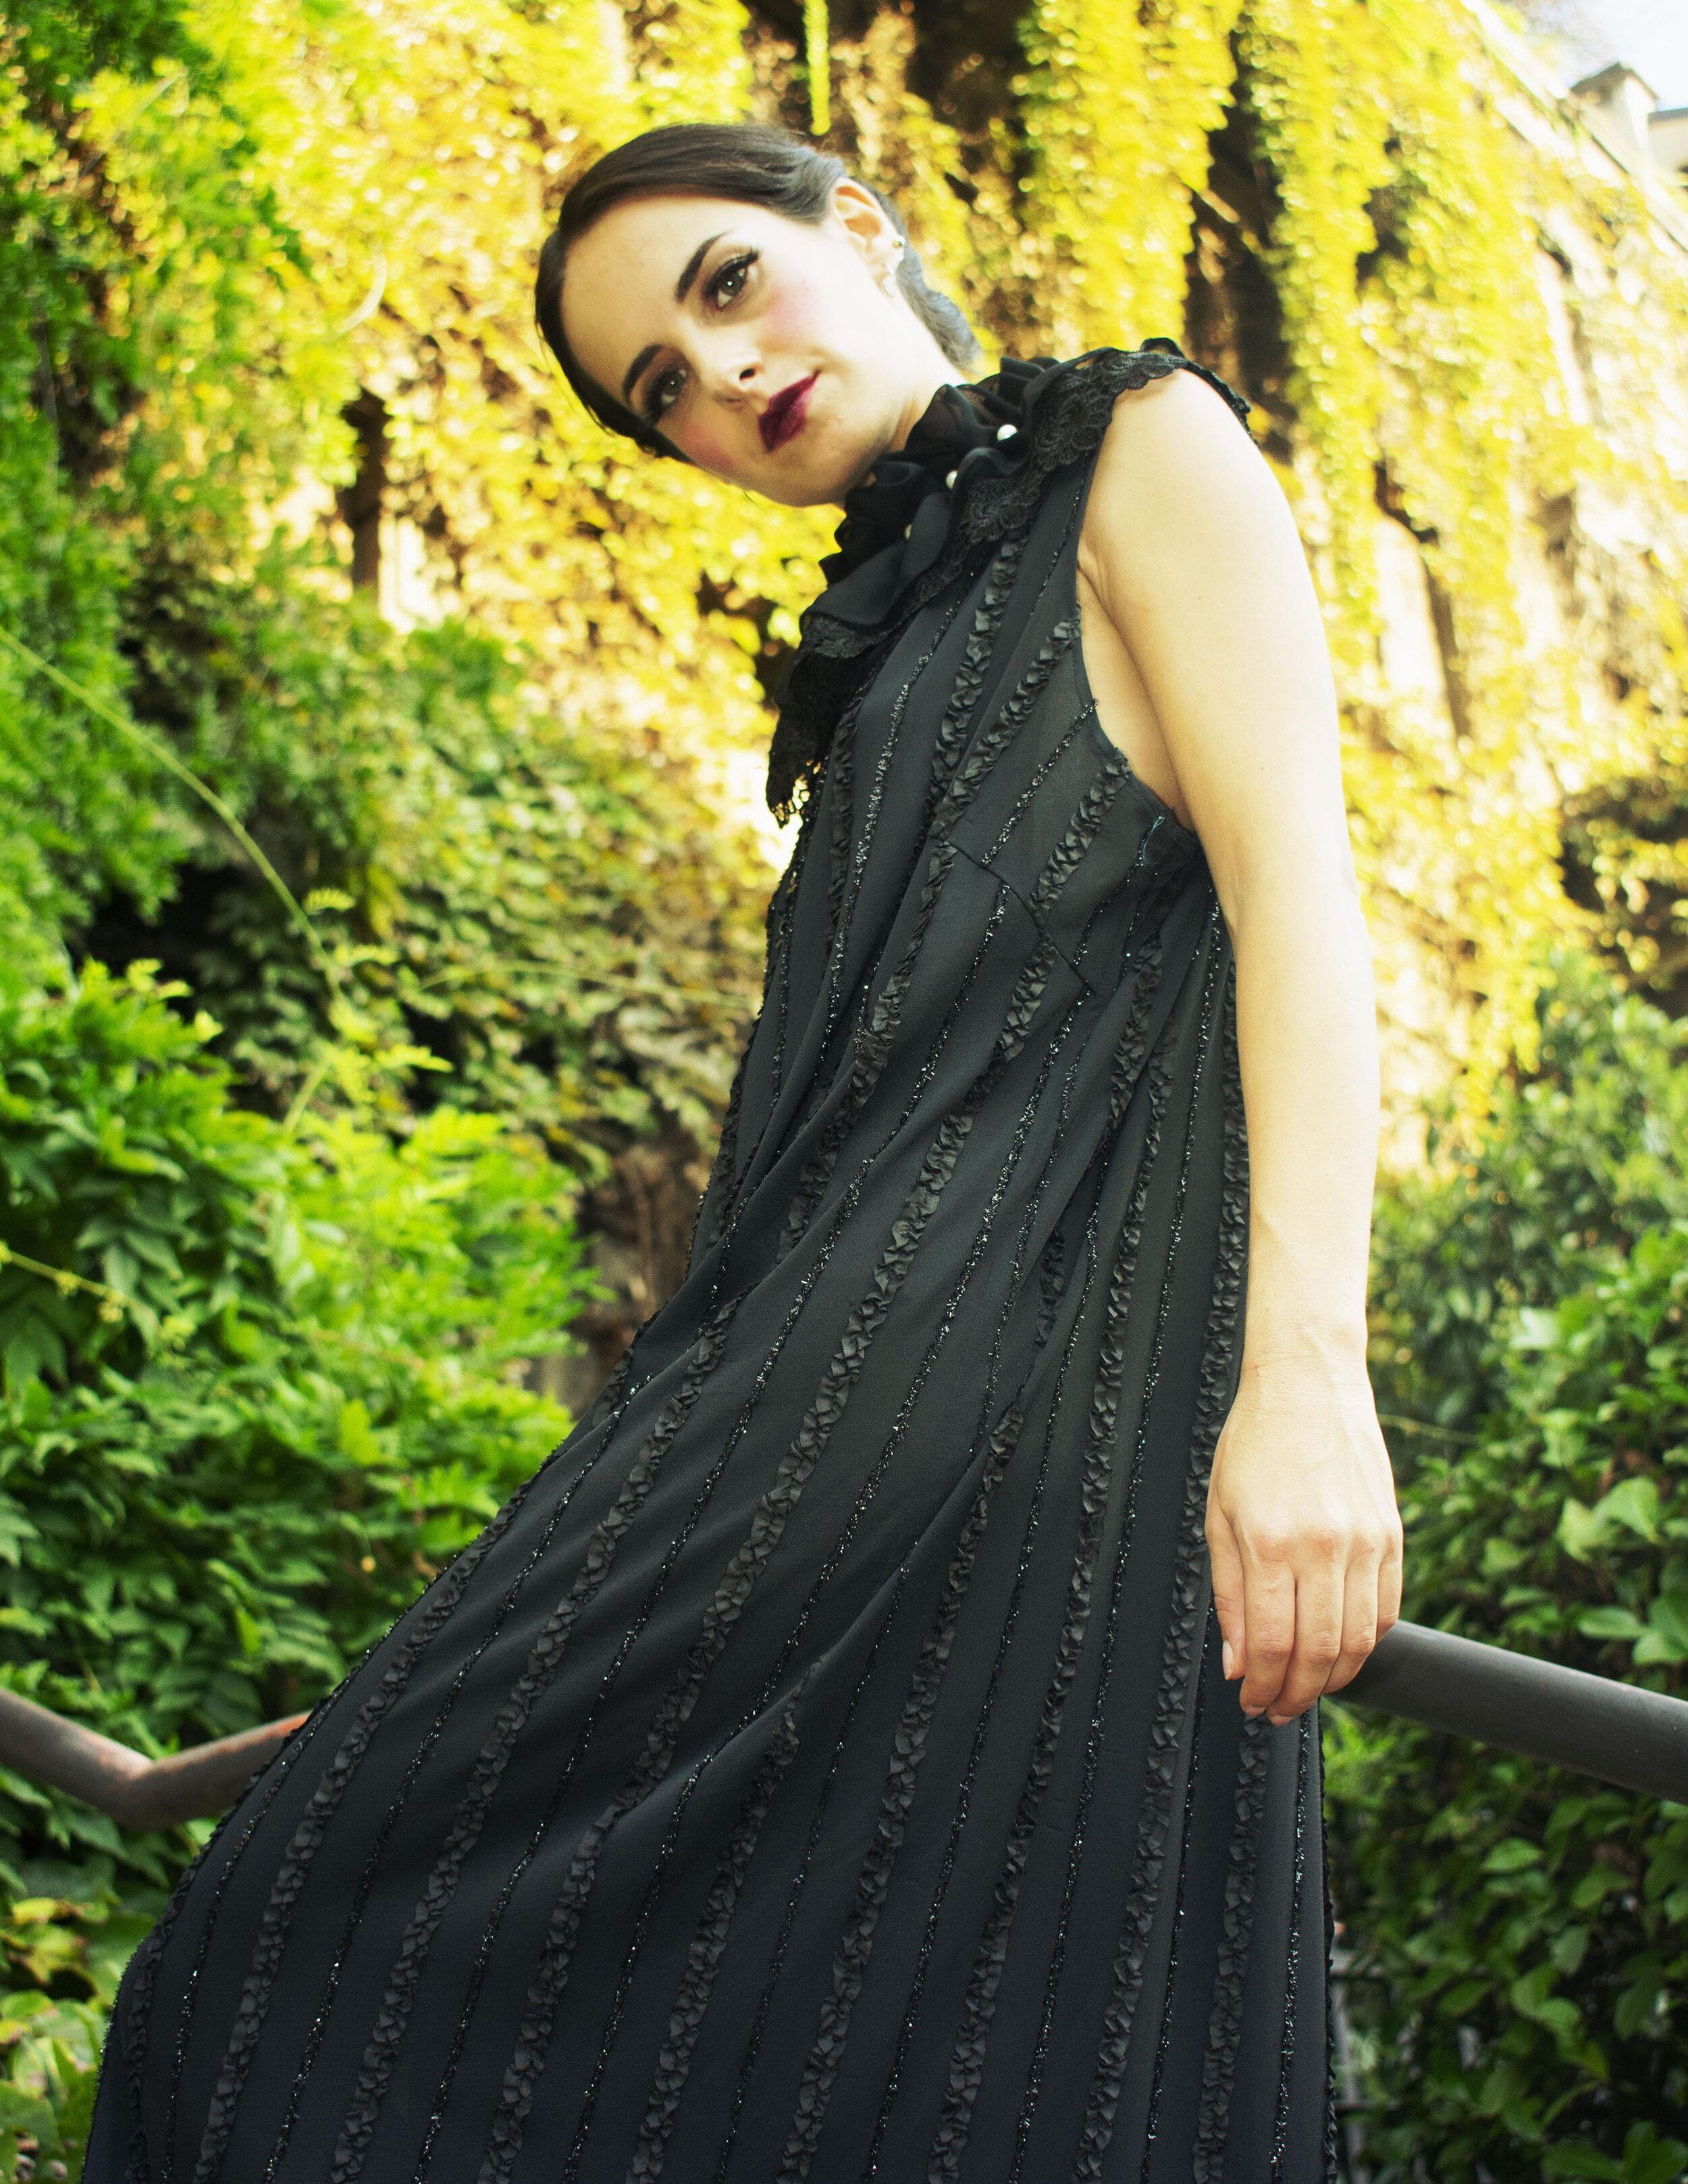 Vintage Dress by Humana Vintage Milan Accessories by Aldo